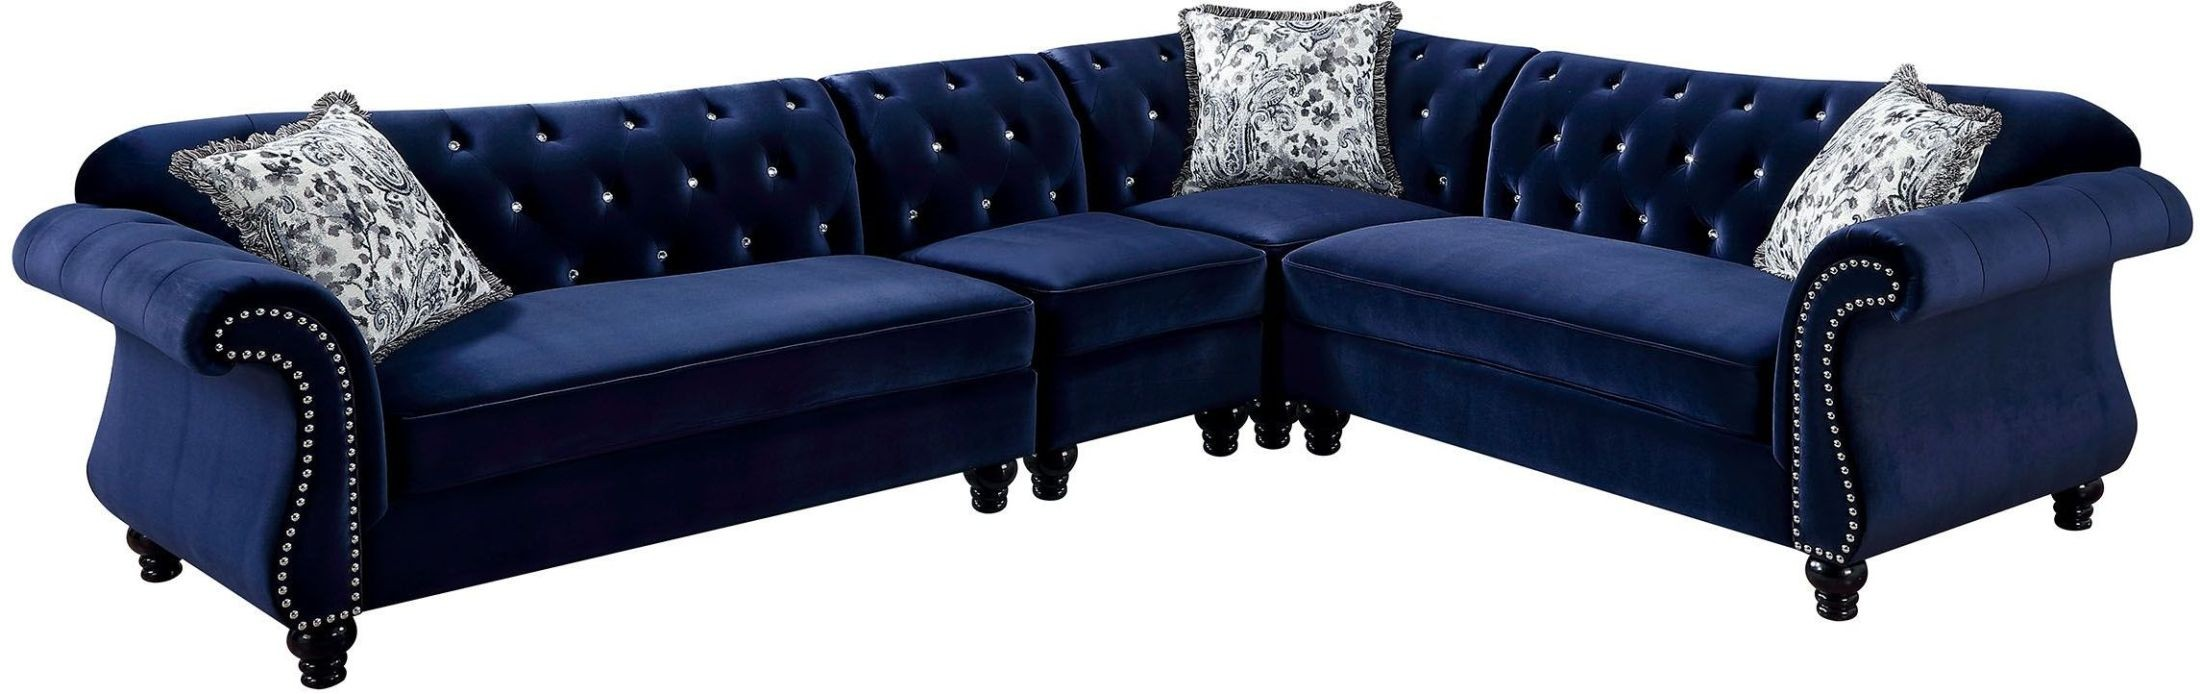 Jolanda Ii Blue Sectional Furniture Plus